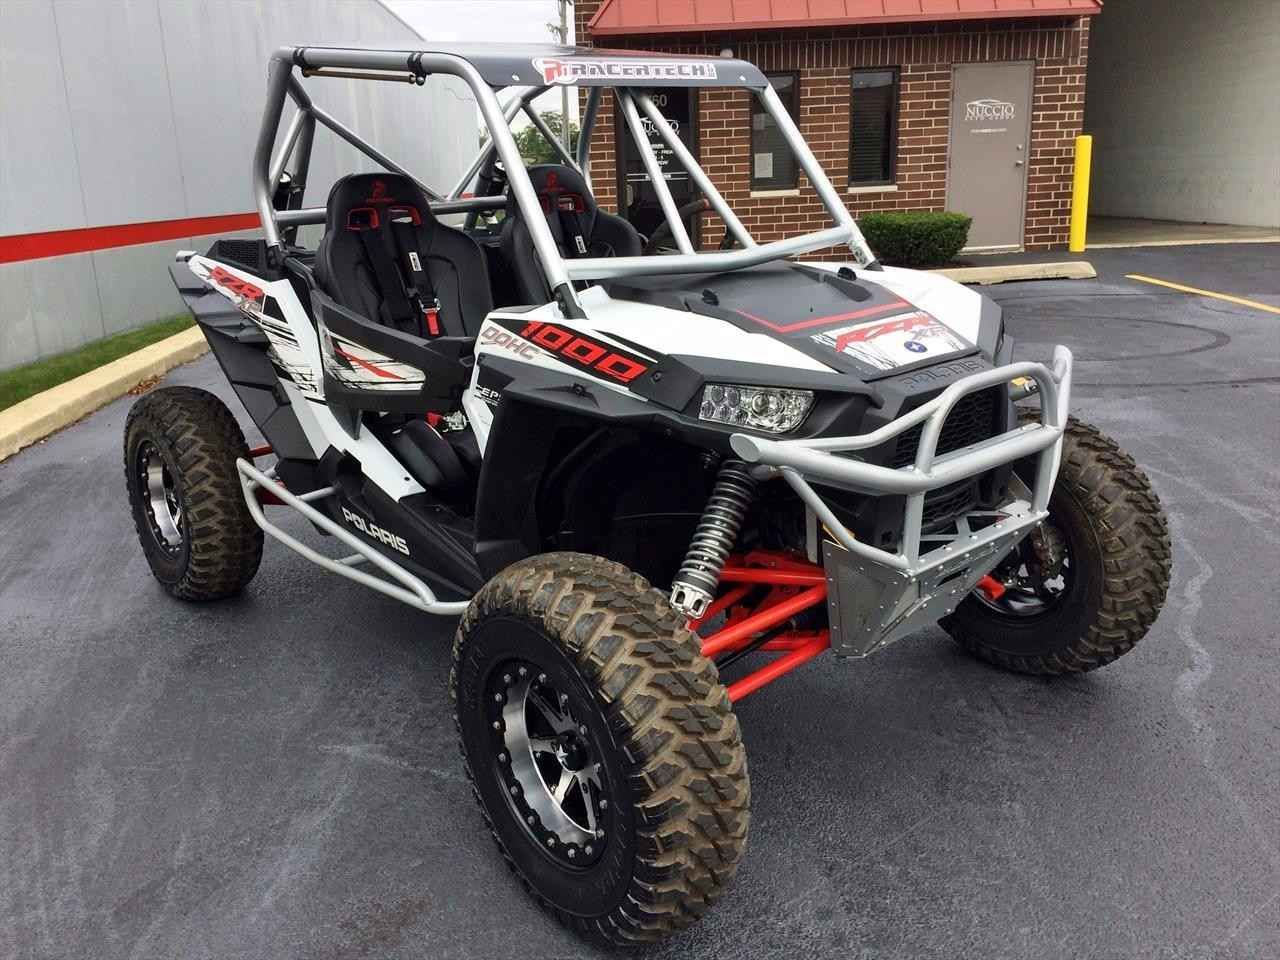 Used 2014 Polaris RZR XP 1000 EPS ATVs For Sale in Illinois